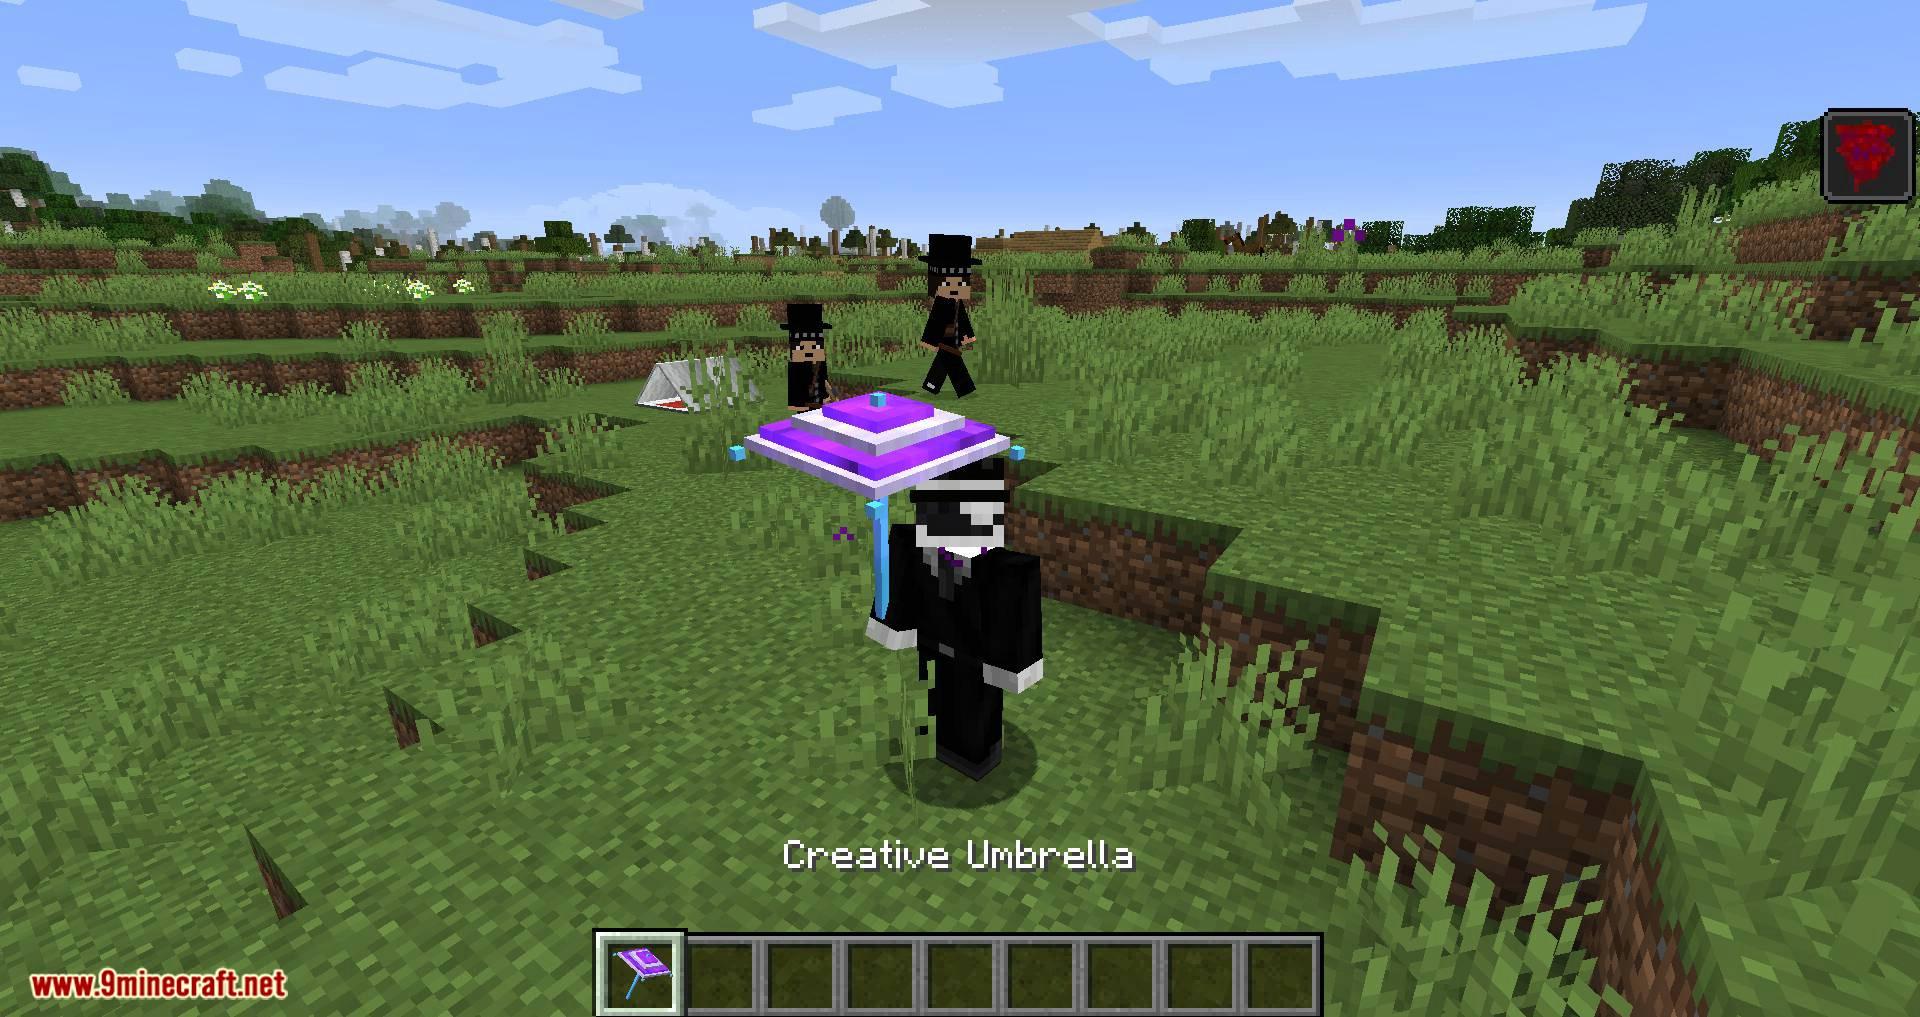 Vampires Need Umbrellas mod for minecraft 10